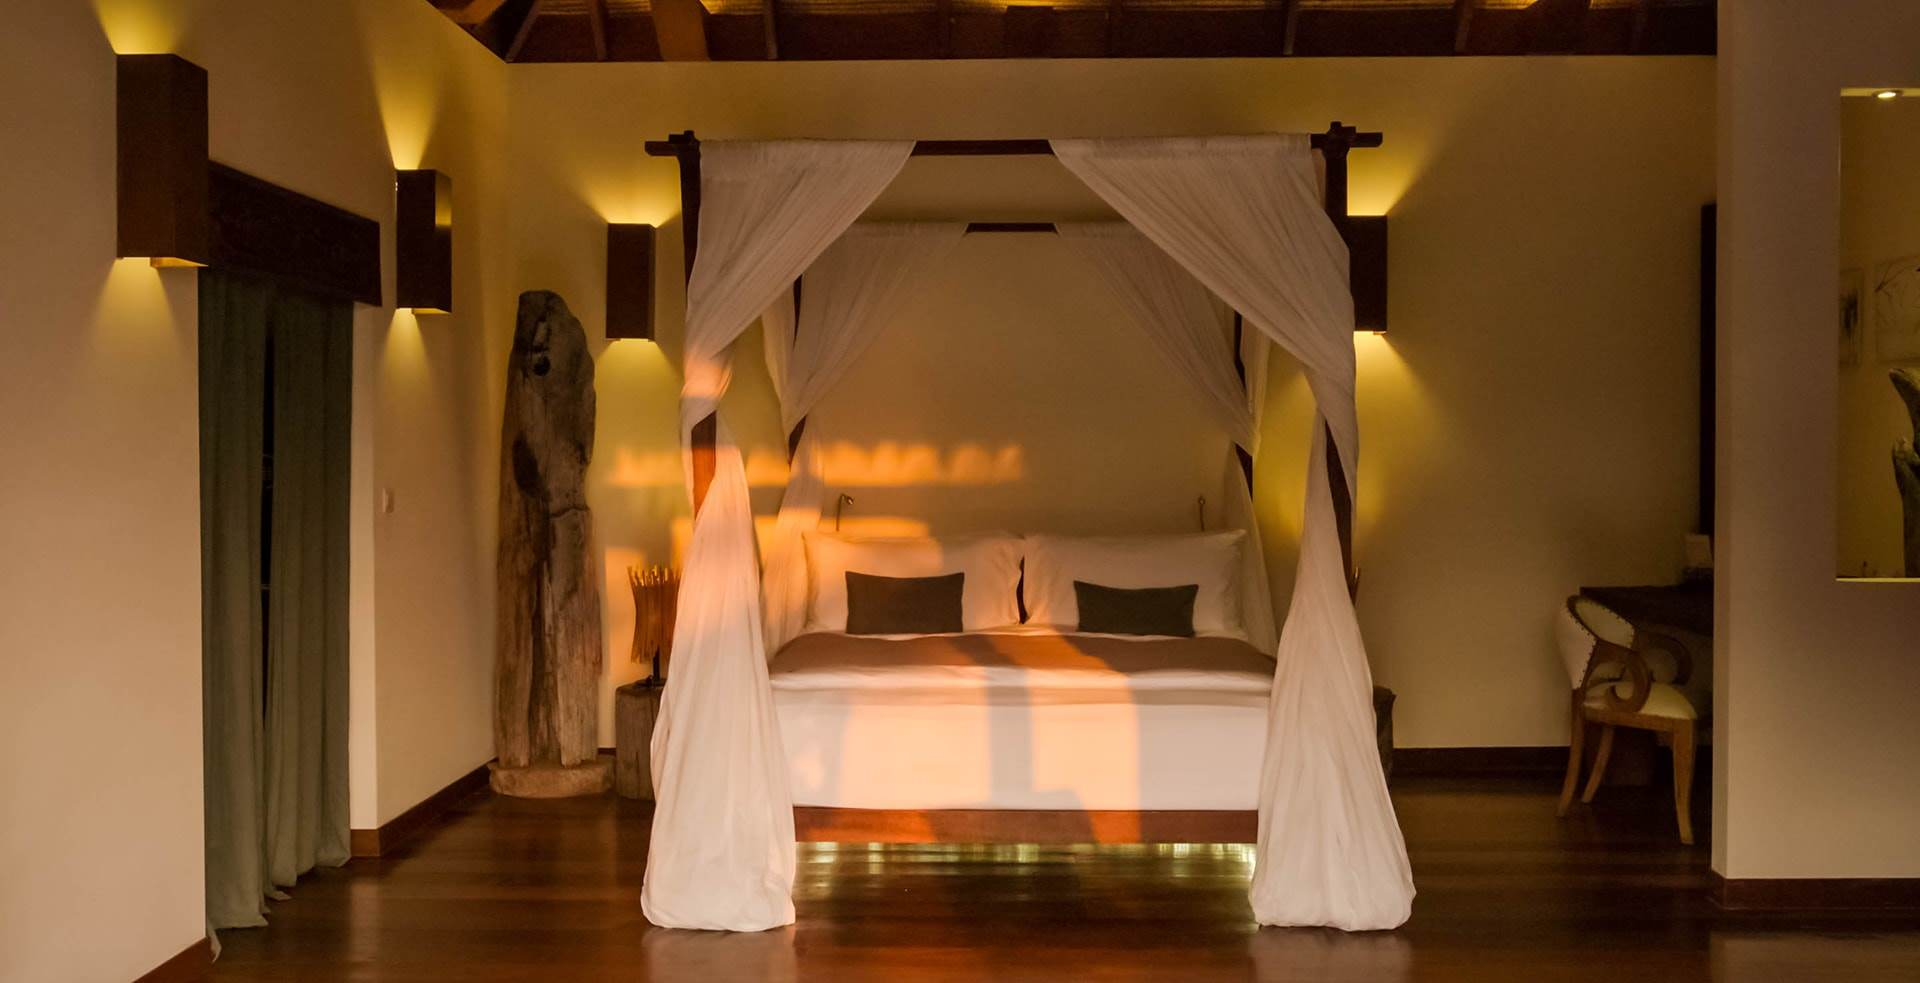 King-size bed in Royal Villa